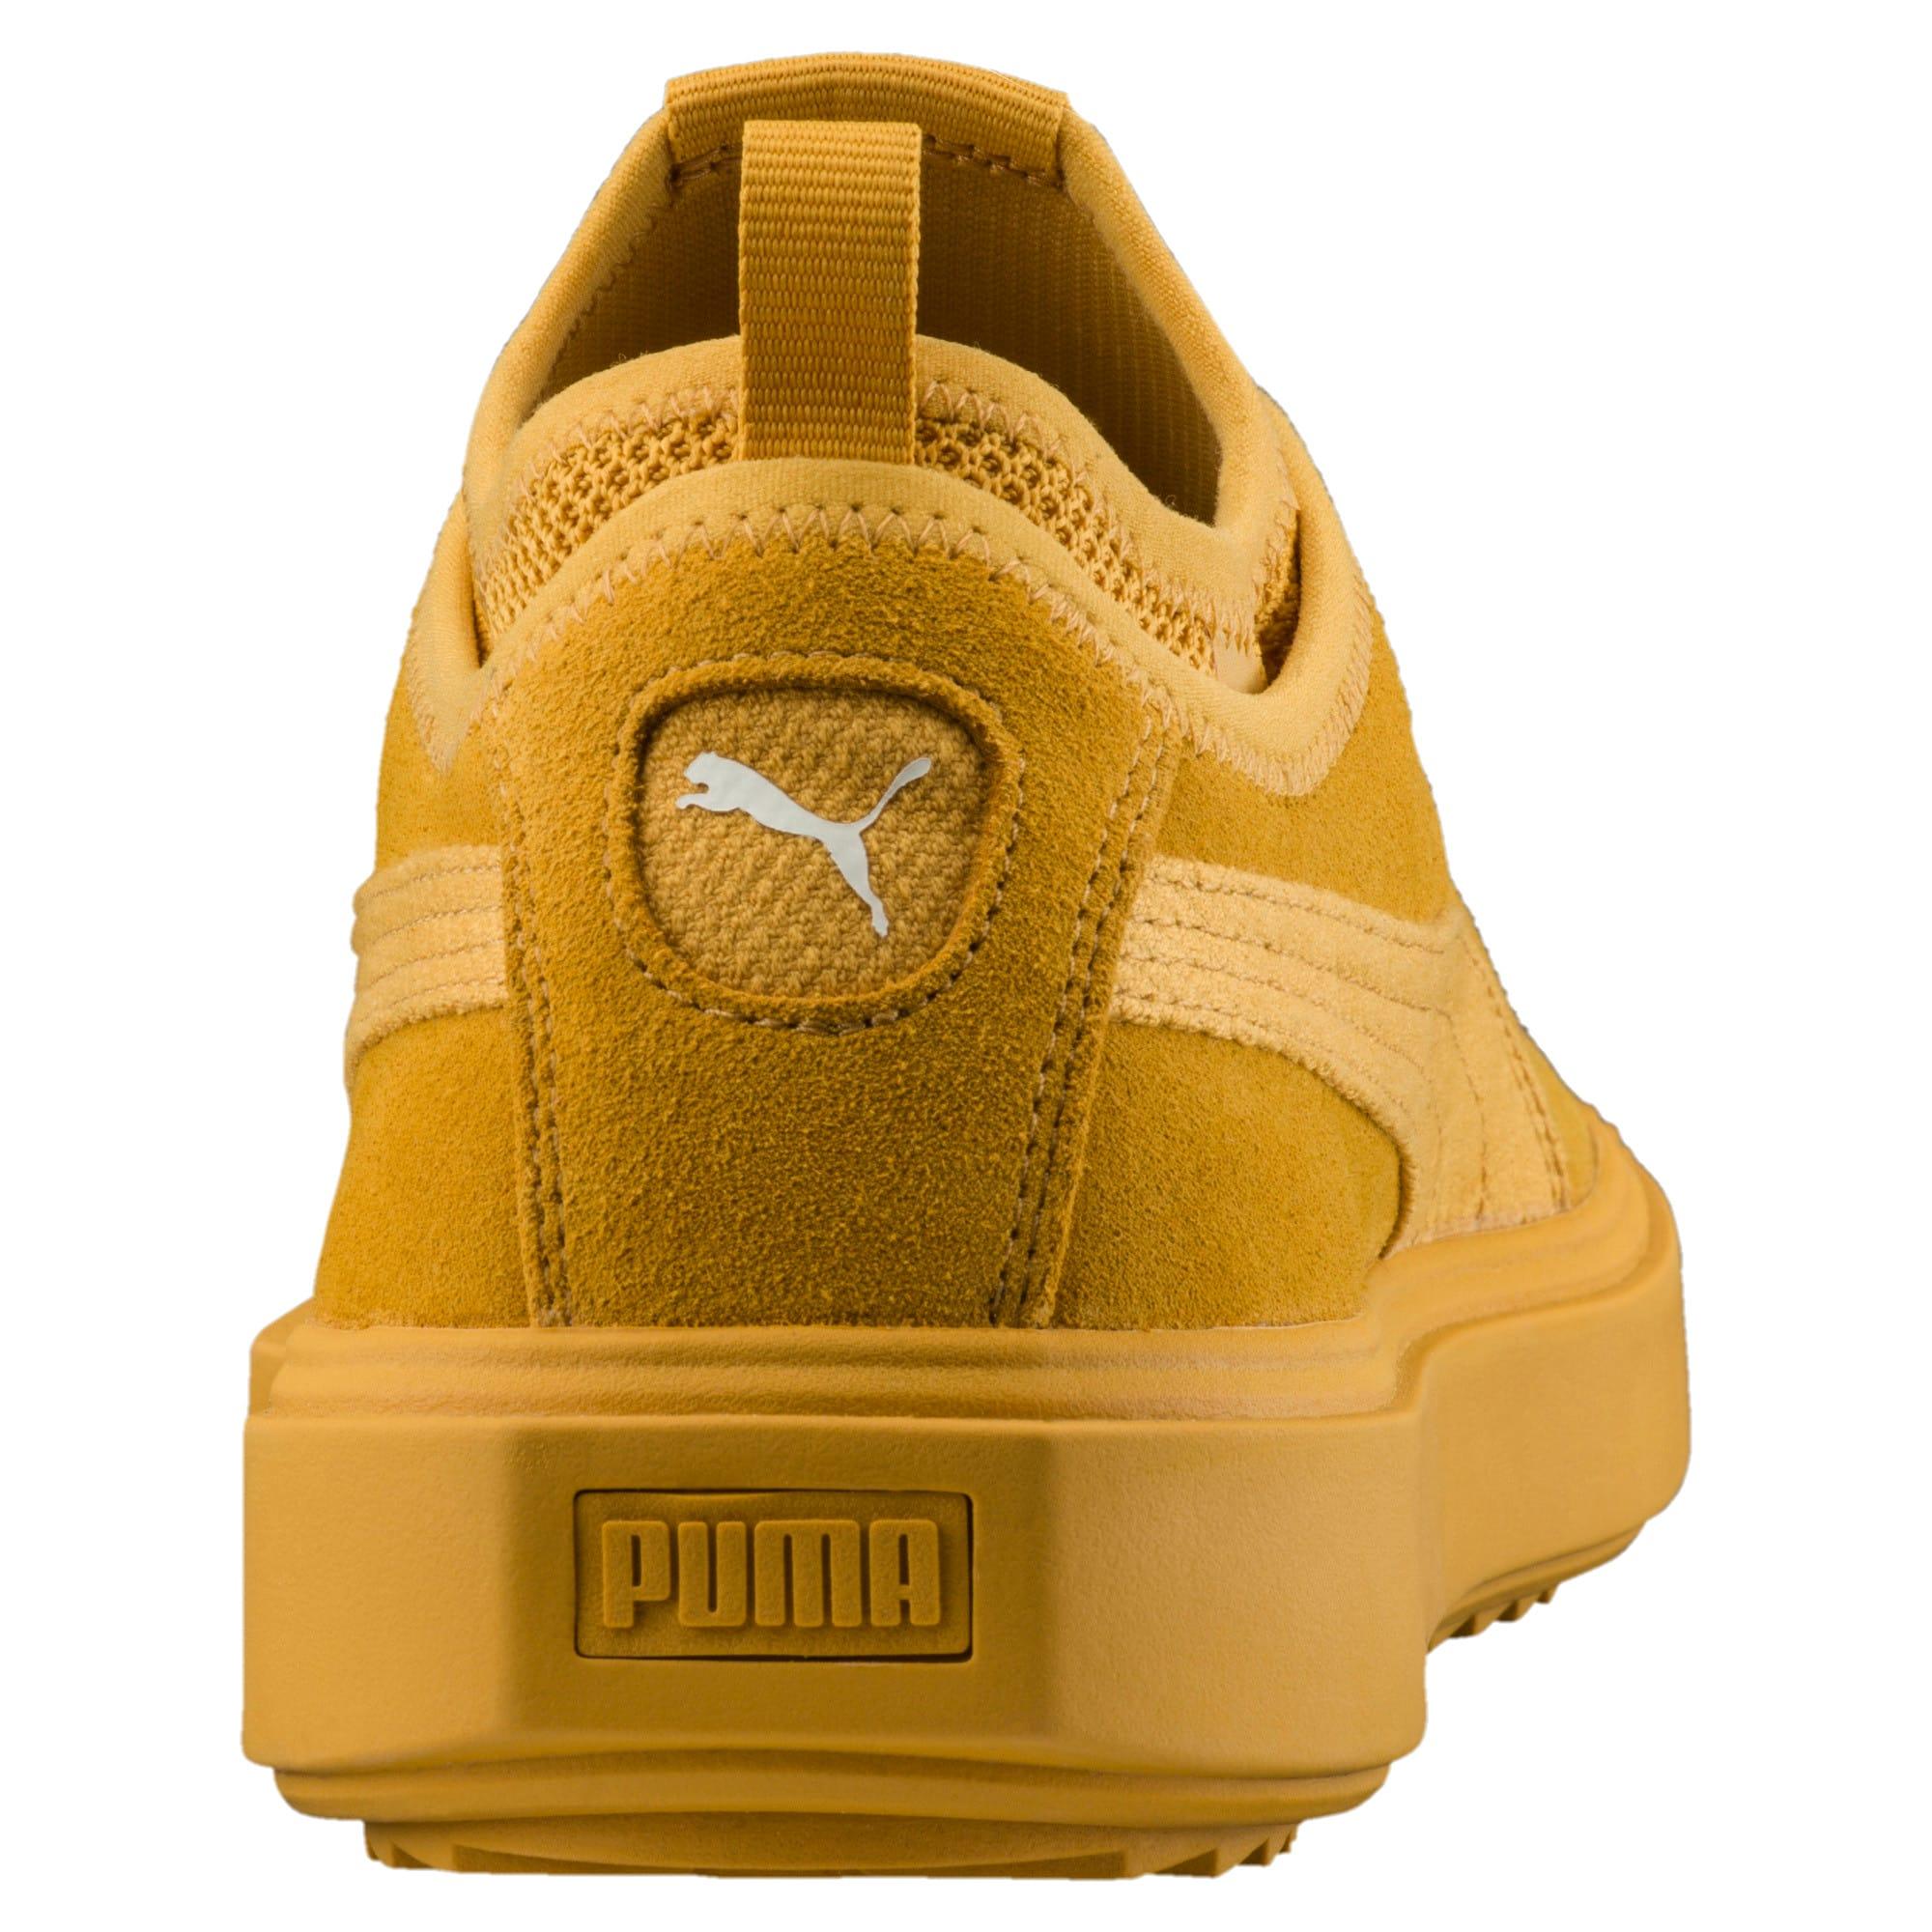 Thumbnail 4 of Breaker Mesh Men's Sneakers, Mineral Yellow-Minl Yellow, medium